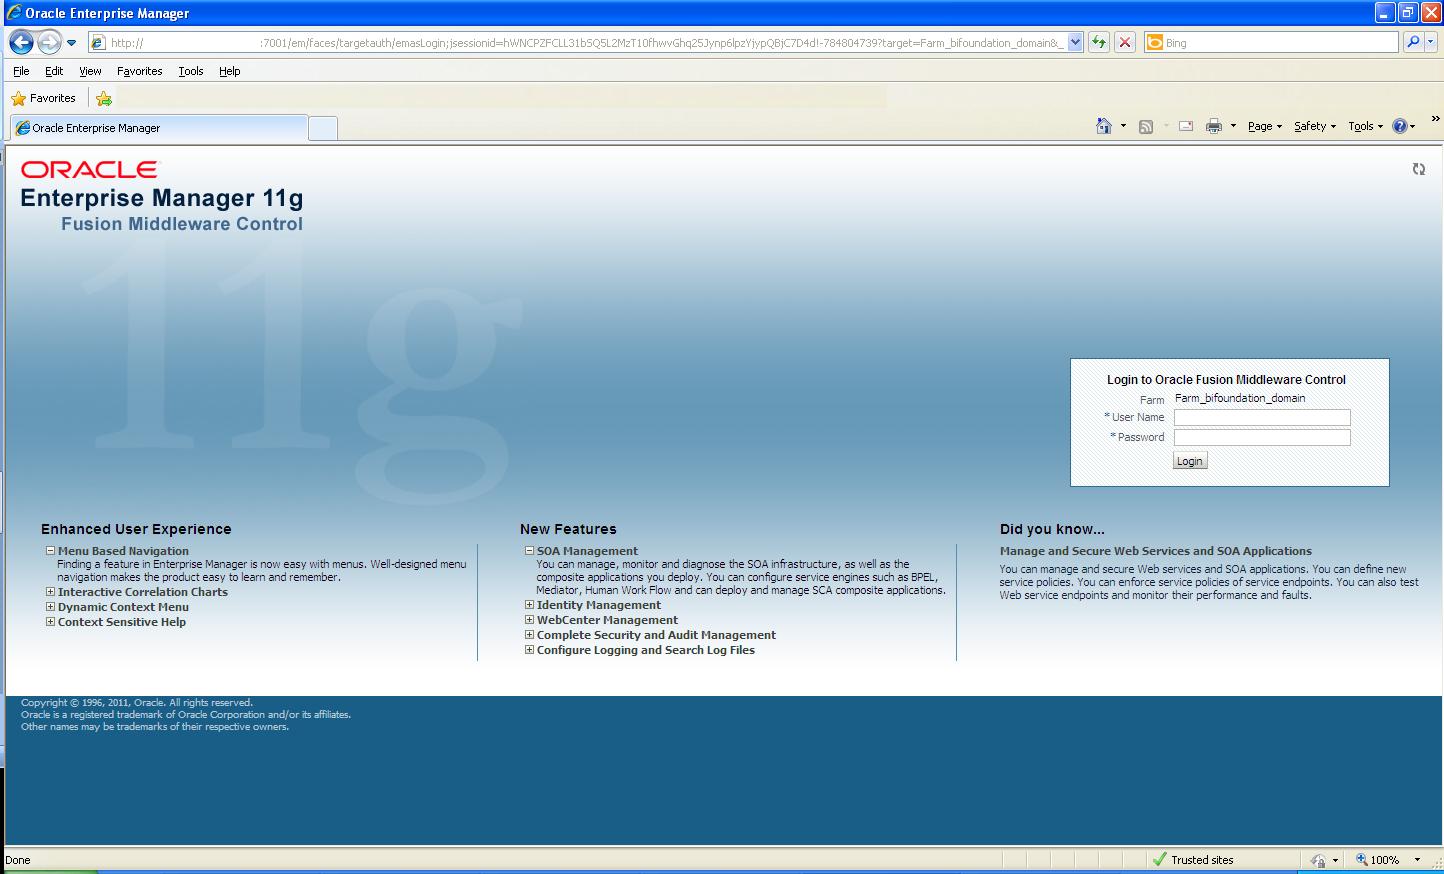 E-Business Suite authentication for BI Publisher - ClearPeaks